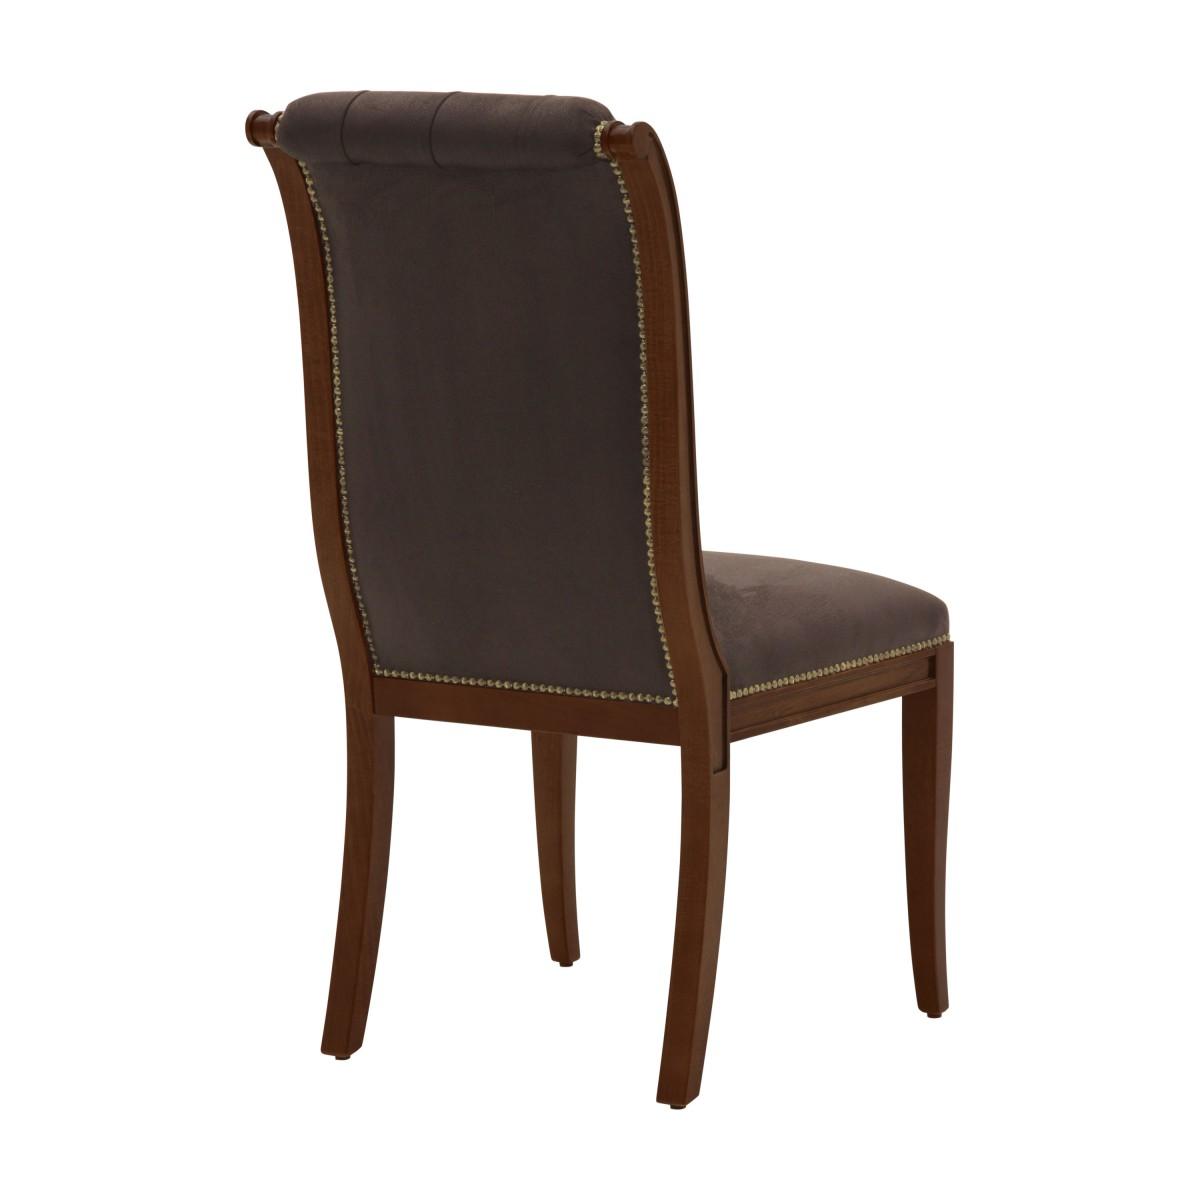 Chair Torino - Sevensedie